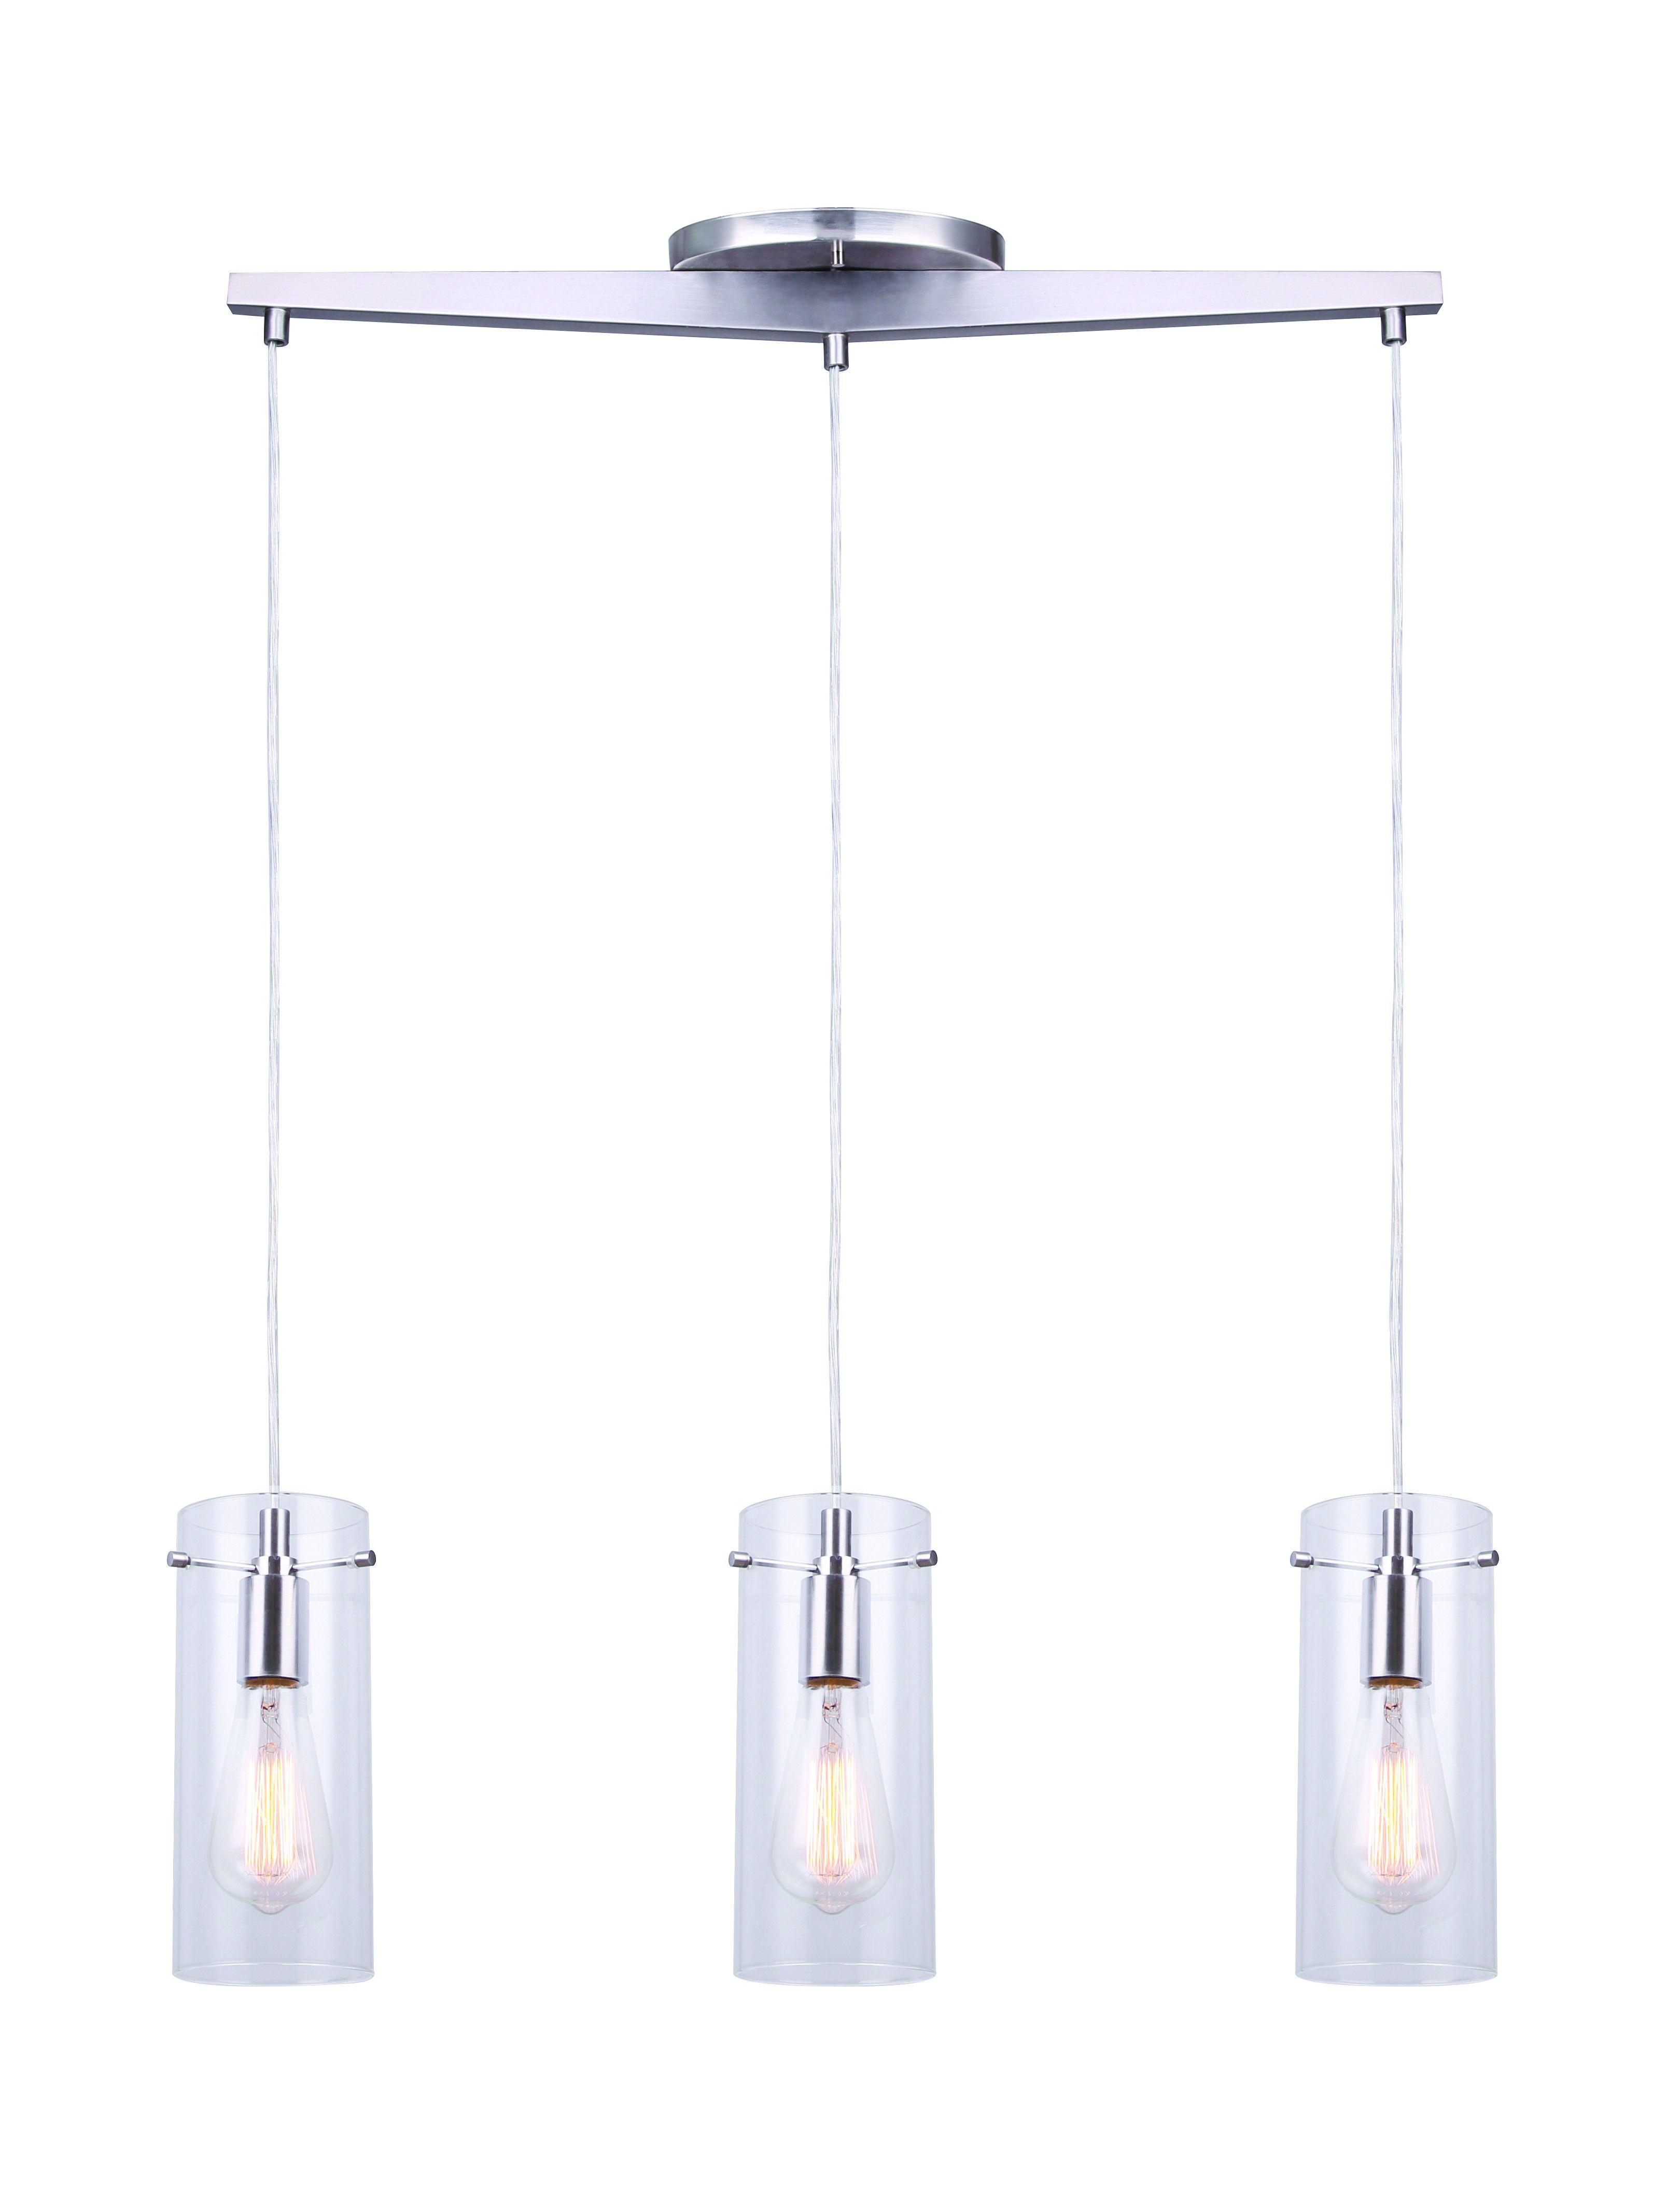 Canarm Ipl759a03bn Joni 3 Light Pendant Ceiling Light Fixture Nickel Ceiling Pendant Lights Ceiling Light Fixtures Pendant Lighting